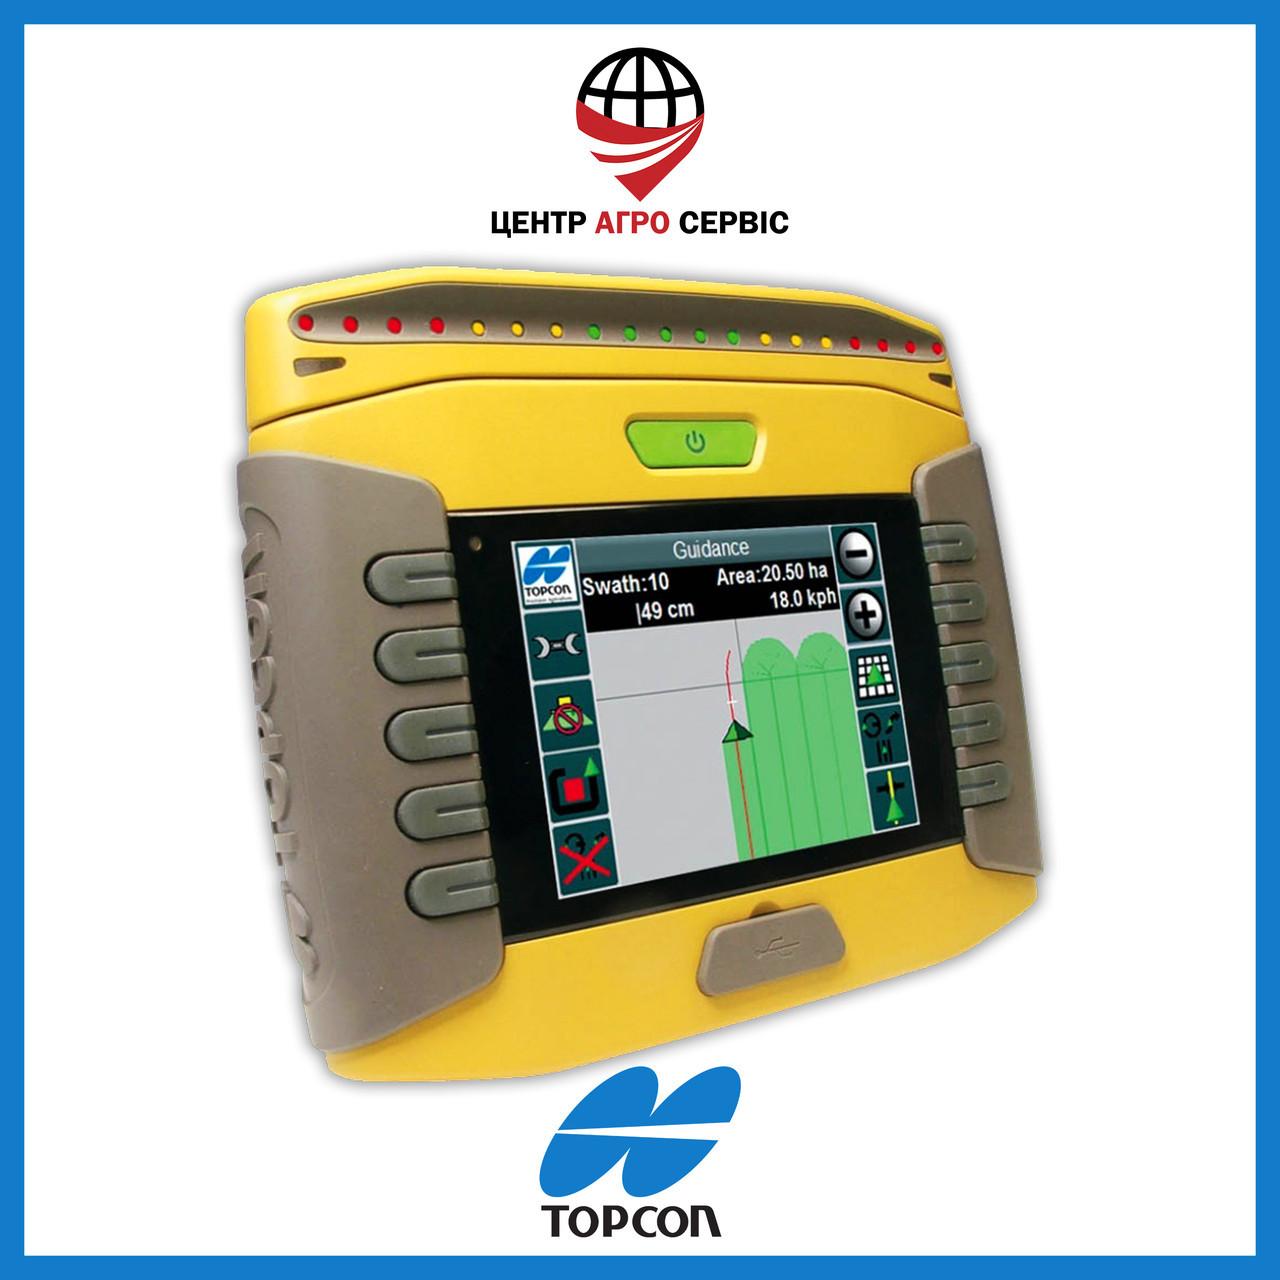 Gps навигатор для трактора (навигатор для поля, сельхоз навигатор)  TOPCON 150